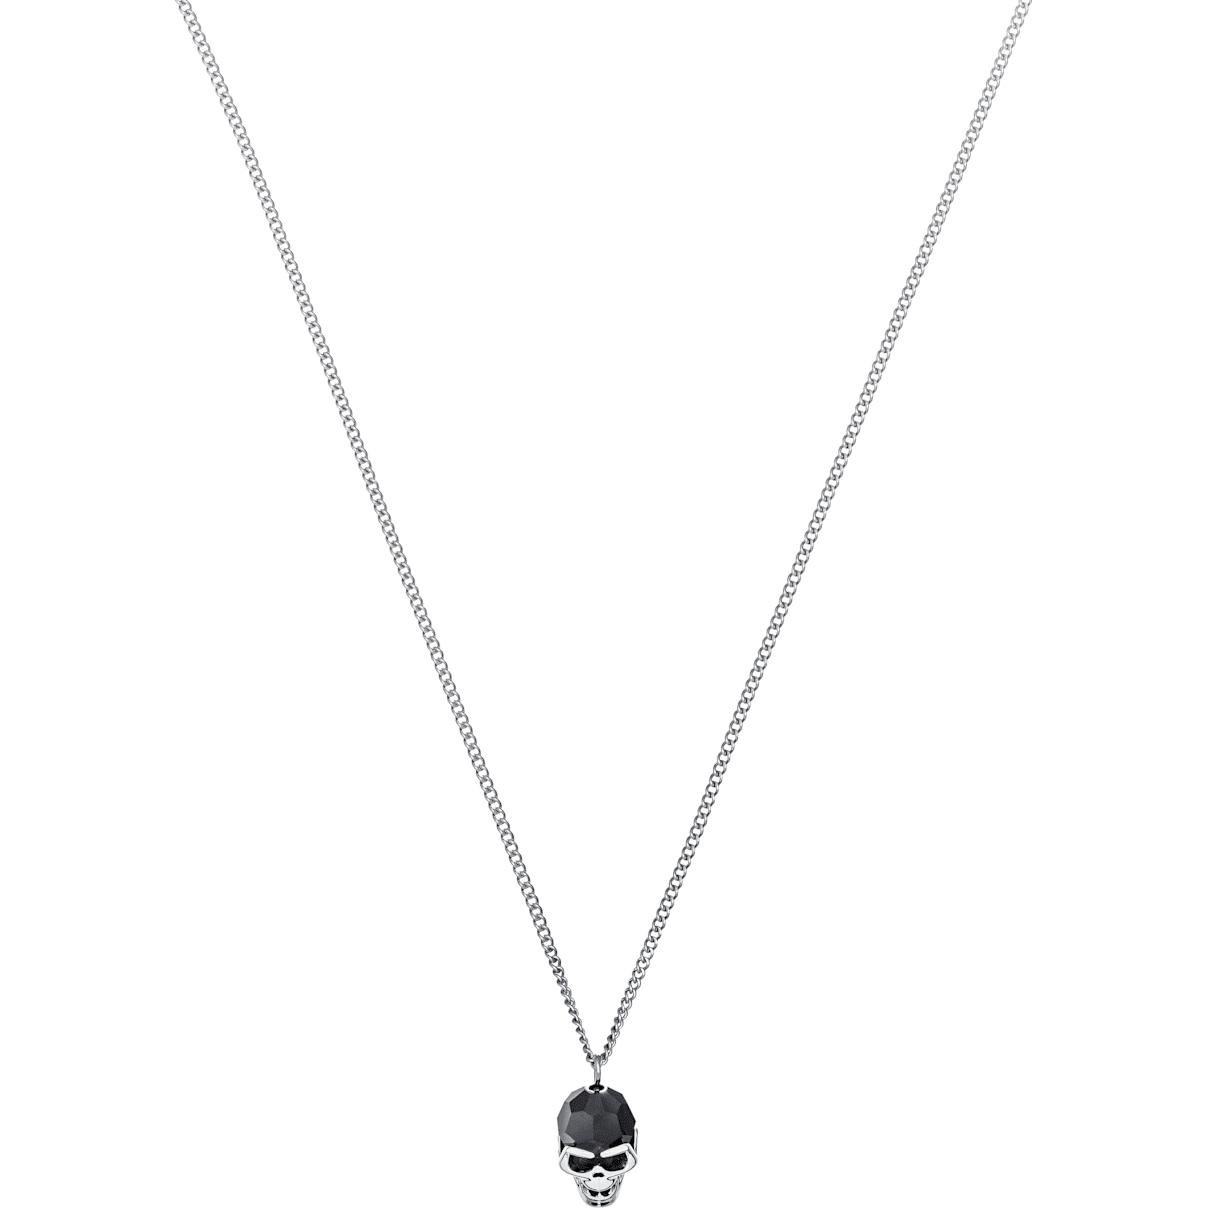 Swarovski Taddeo Pendant, Black, Palladium plated